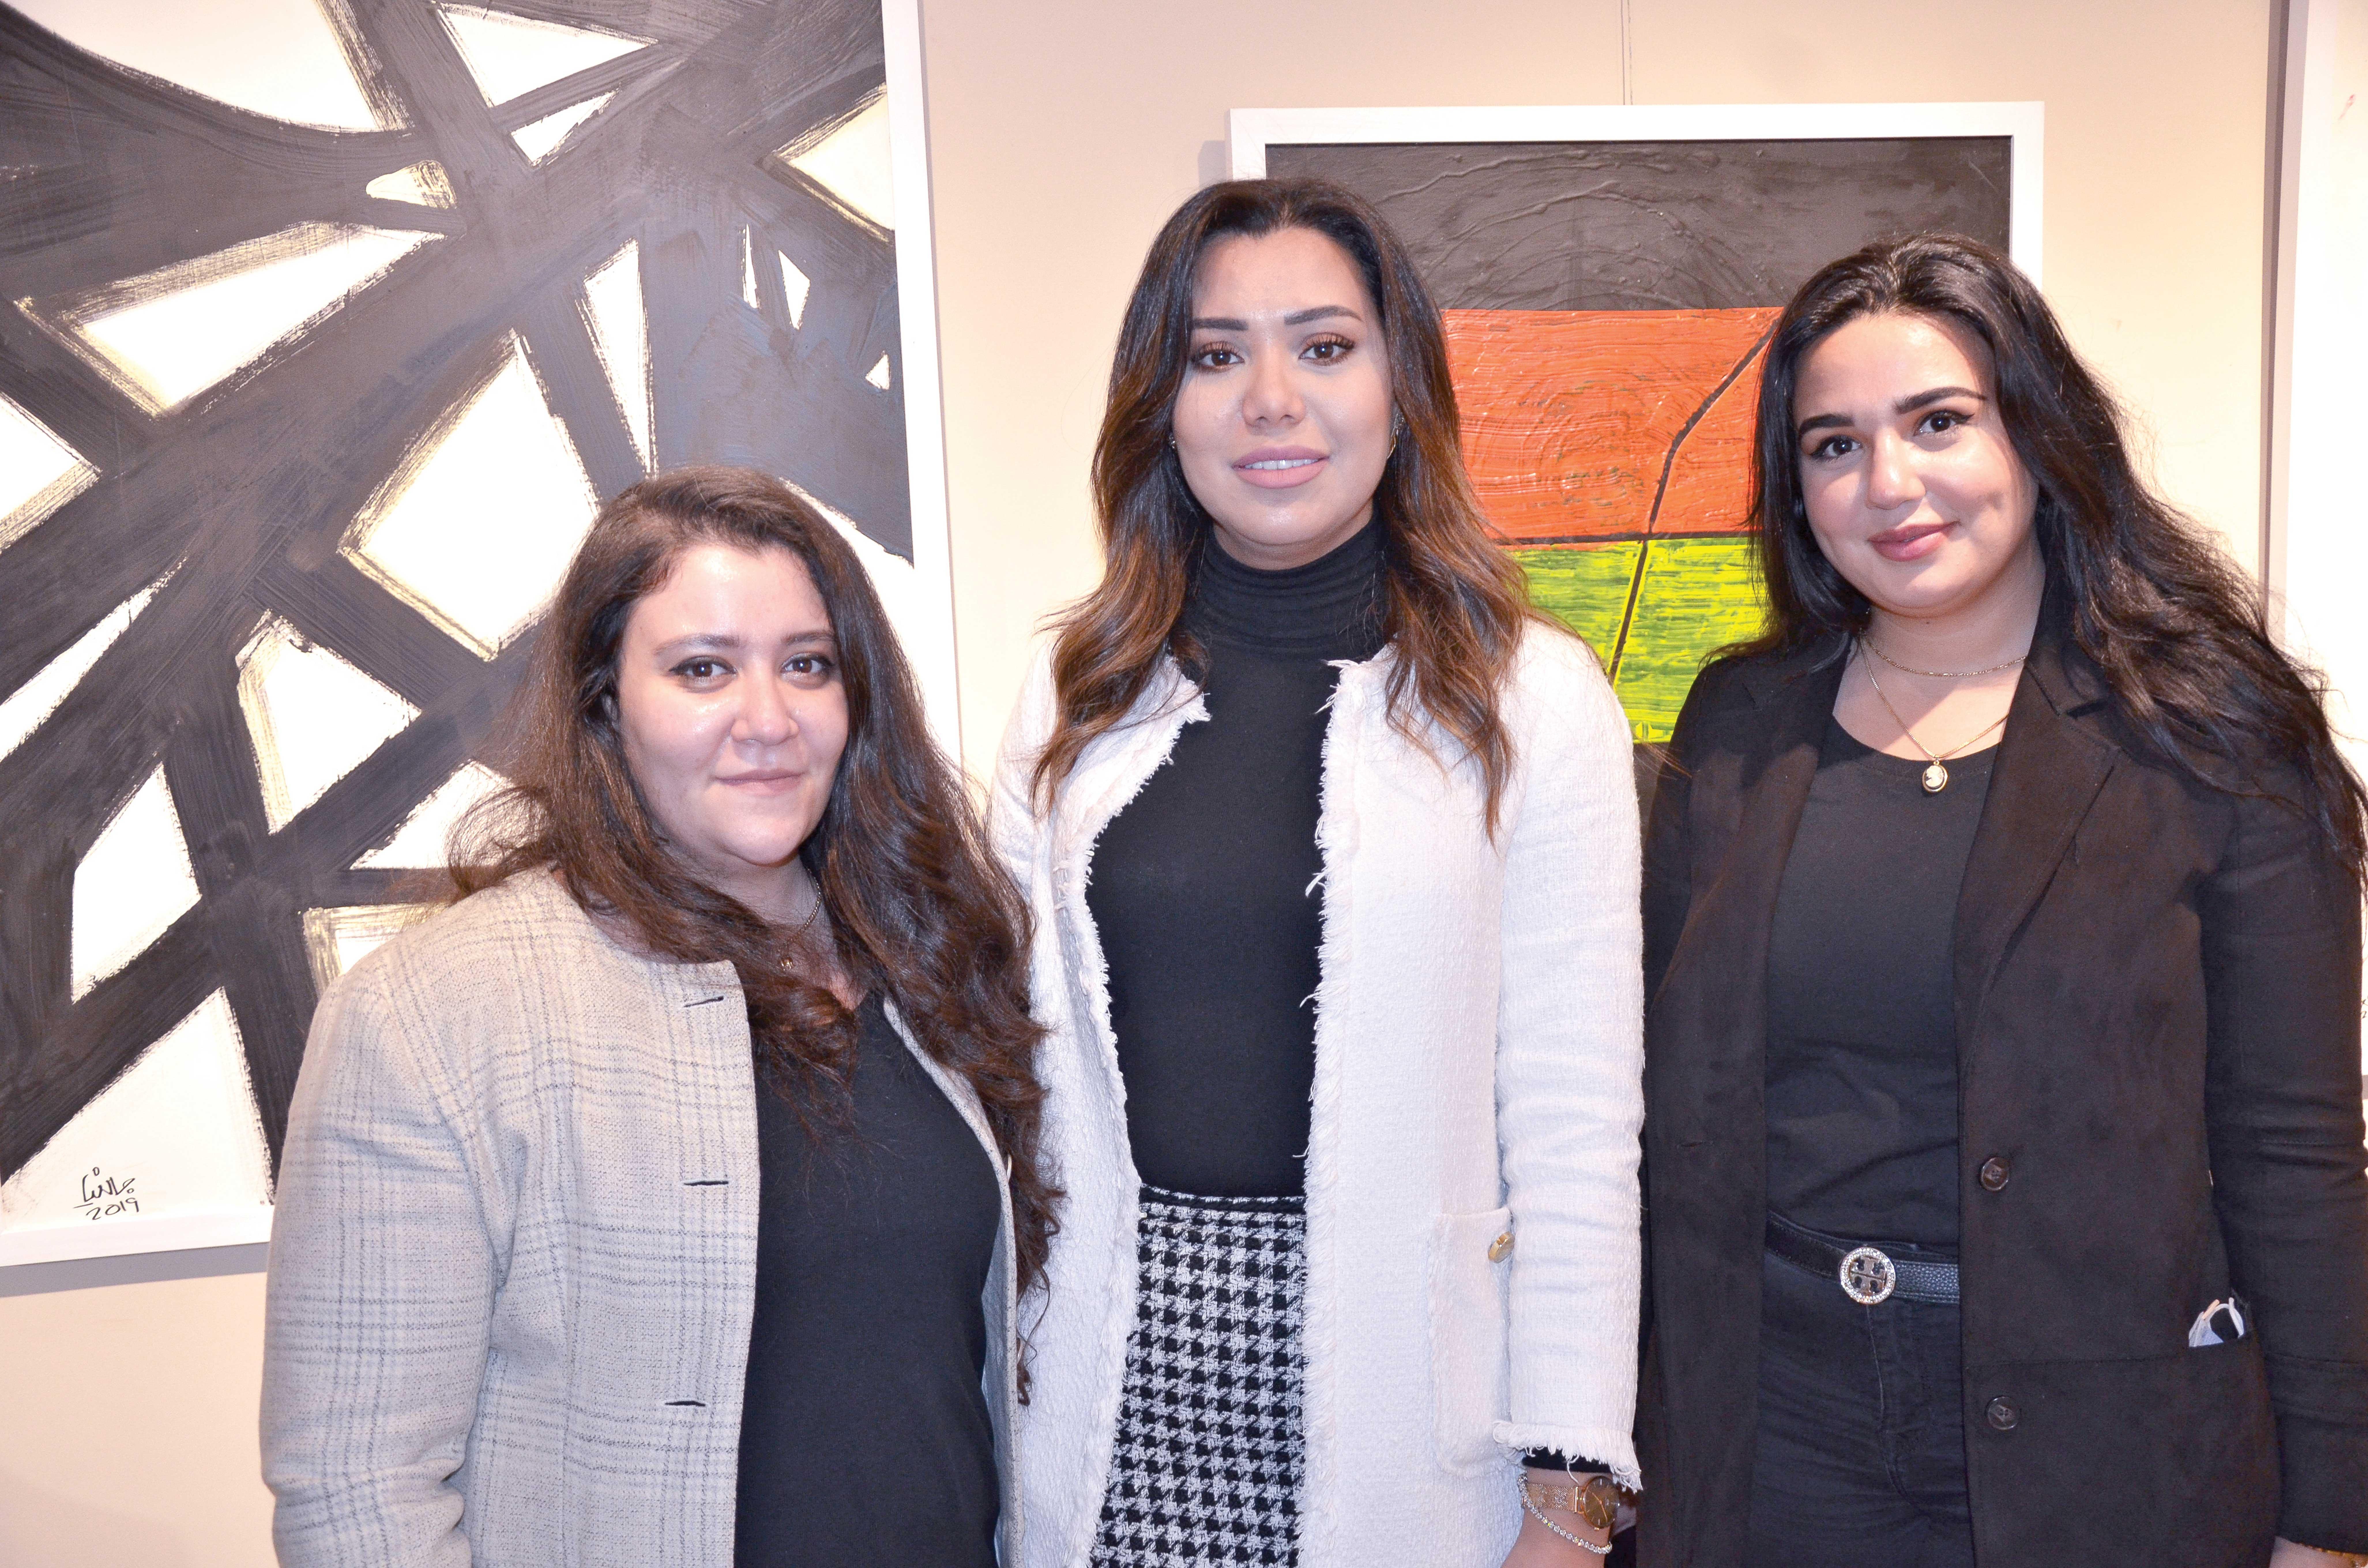 Ms. Israa Elsayed, Ms. Nagwa Ibrahim & Ms. Nermeen Mgady